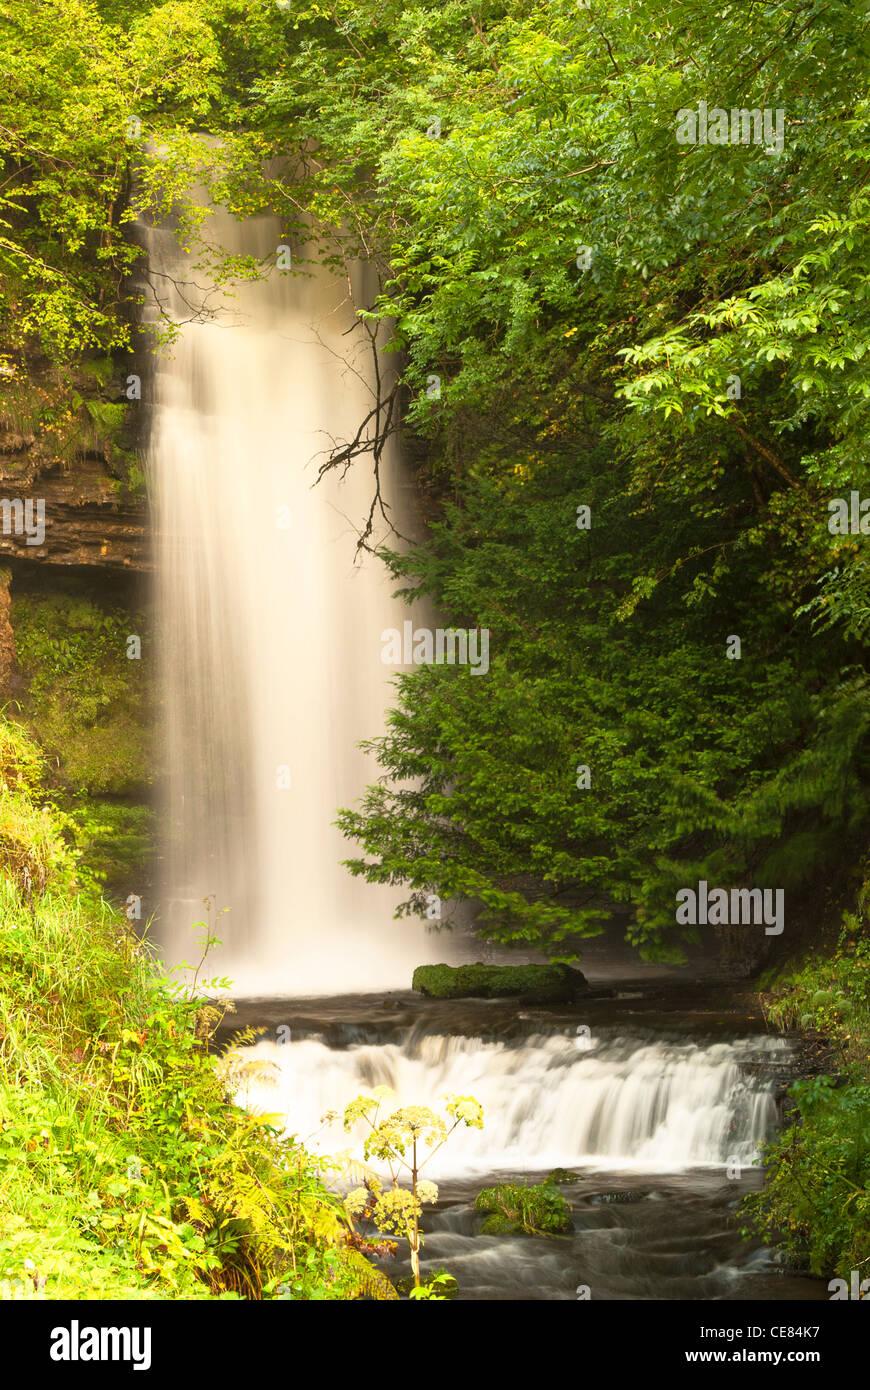 Glencar Waterfall - Stock Image